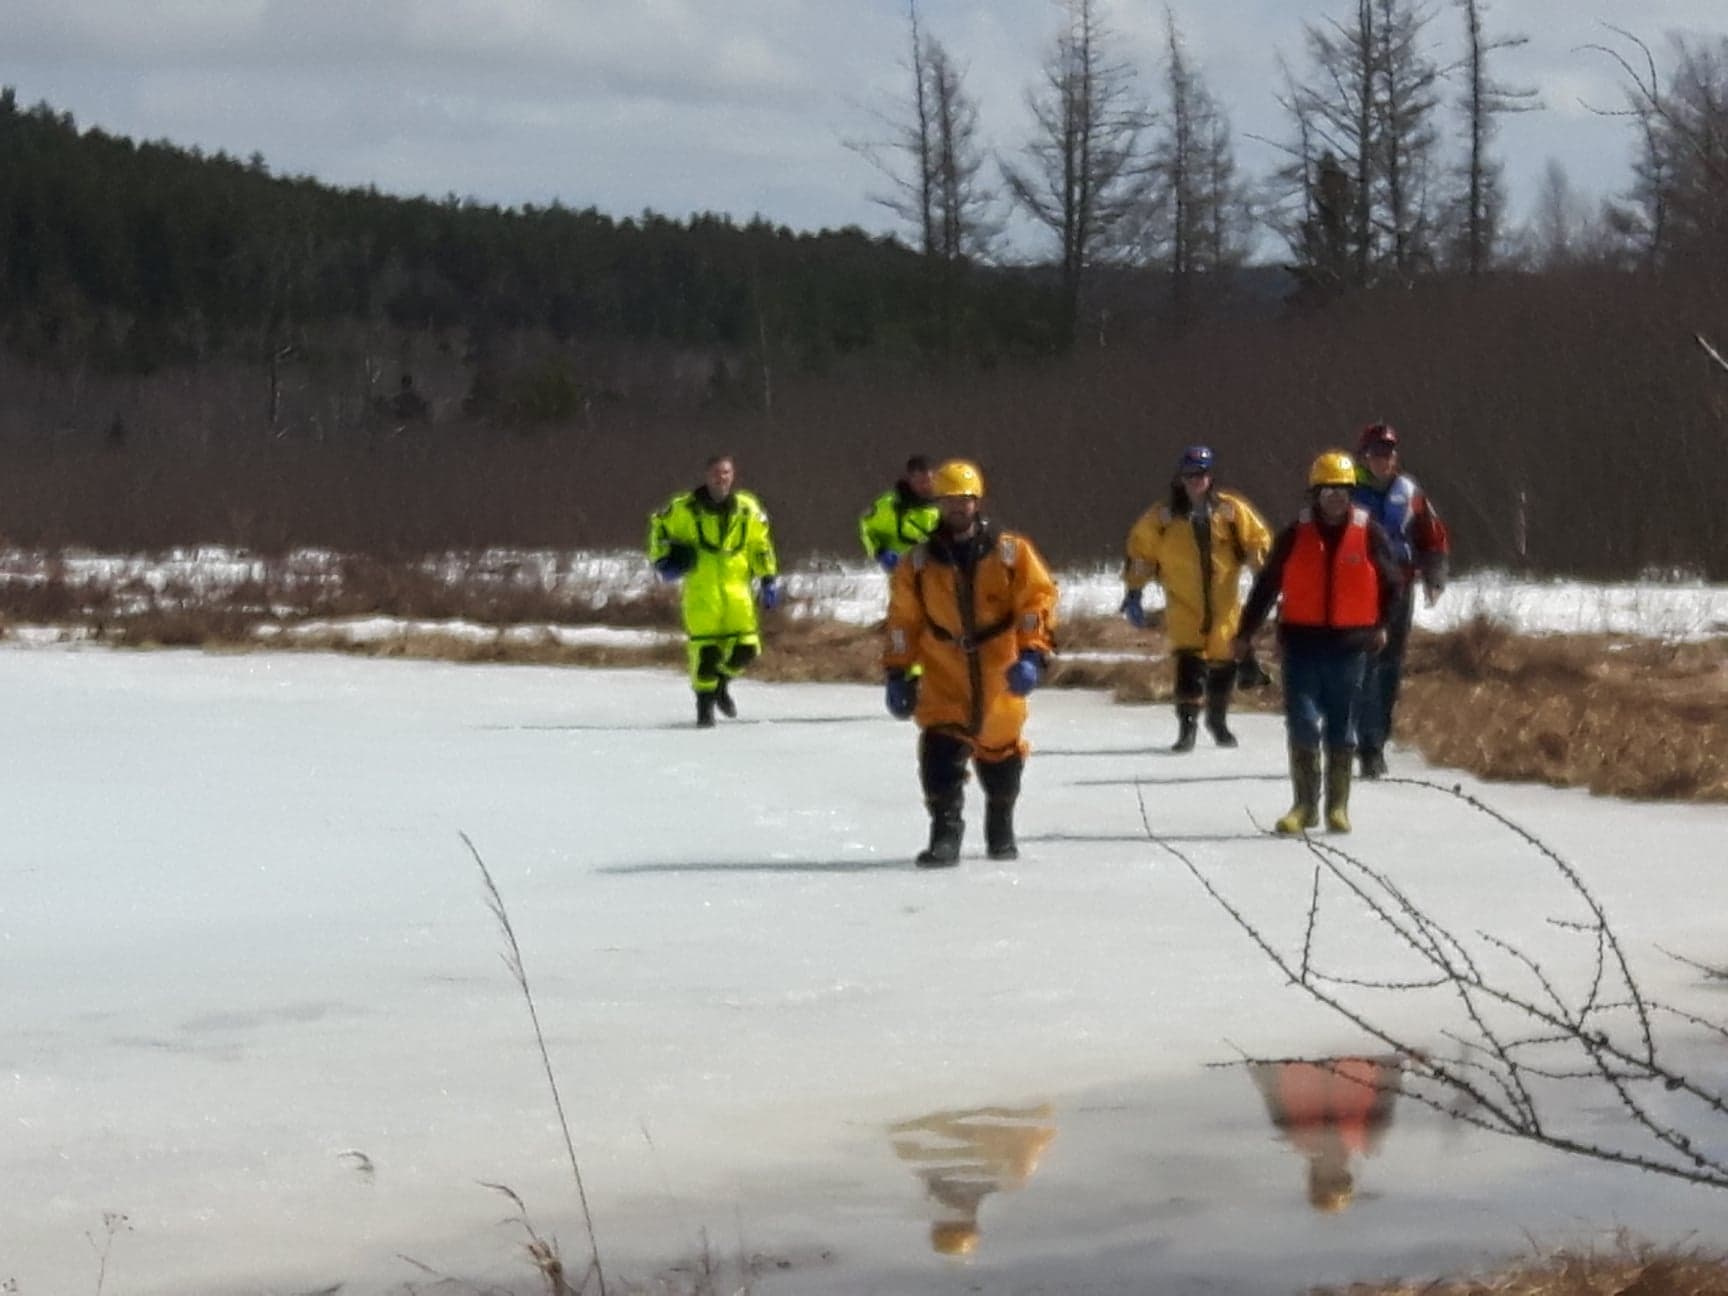 https://0901.nccdn.net/4_2/000/000/071/260/group-walking-on-ice-1728x1296.jpg